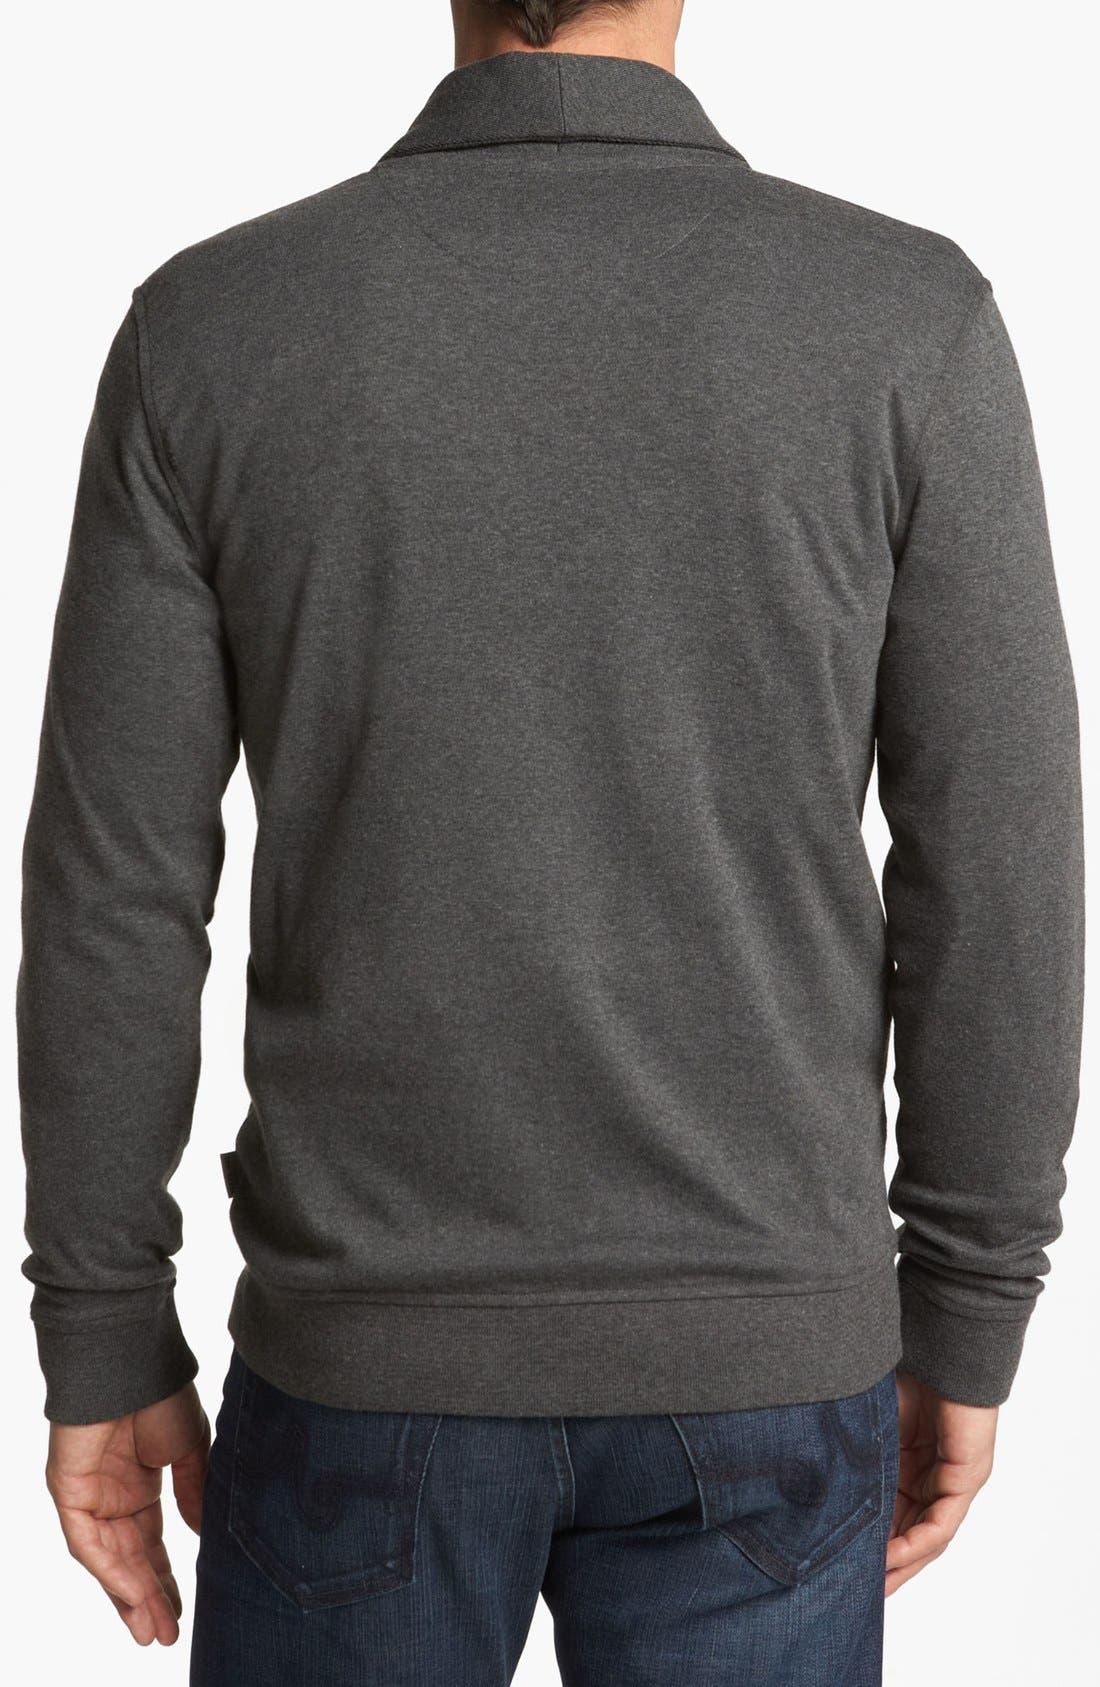 Alternate Image 2  - Ted Baker London 'Norre' Shawl Collar Knit Jersey Cardigan